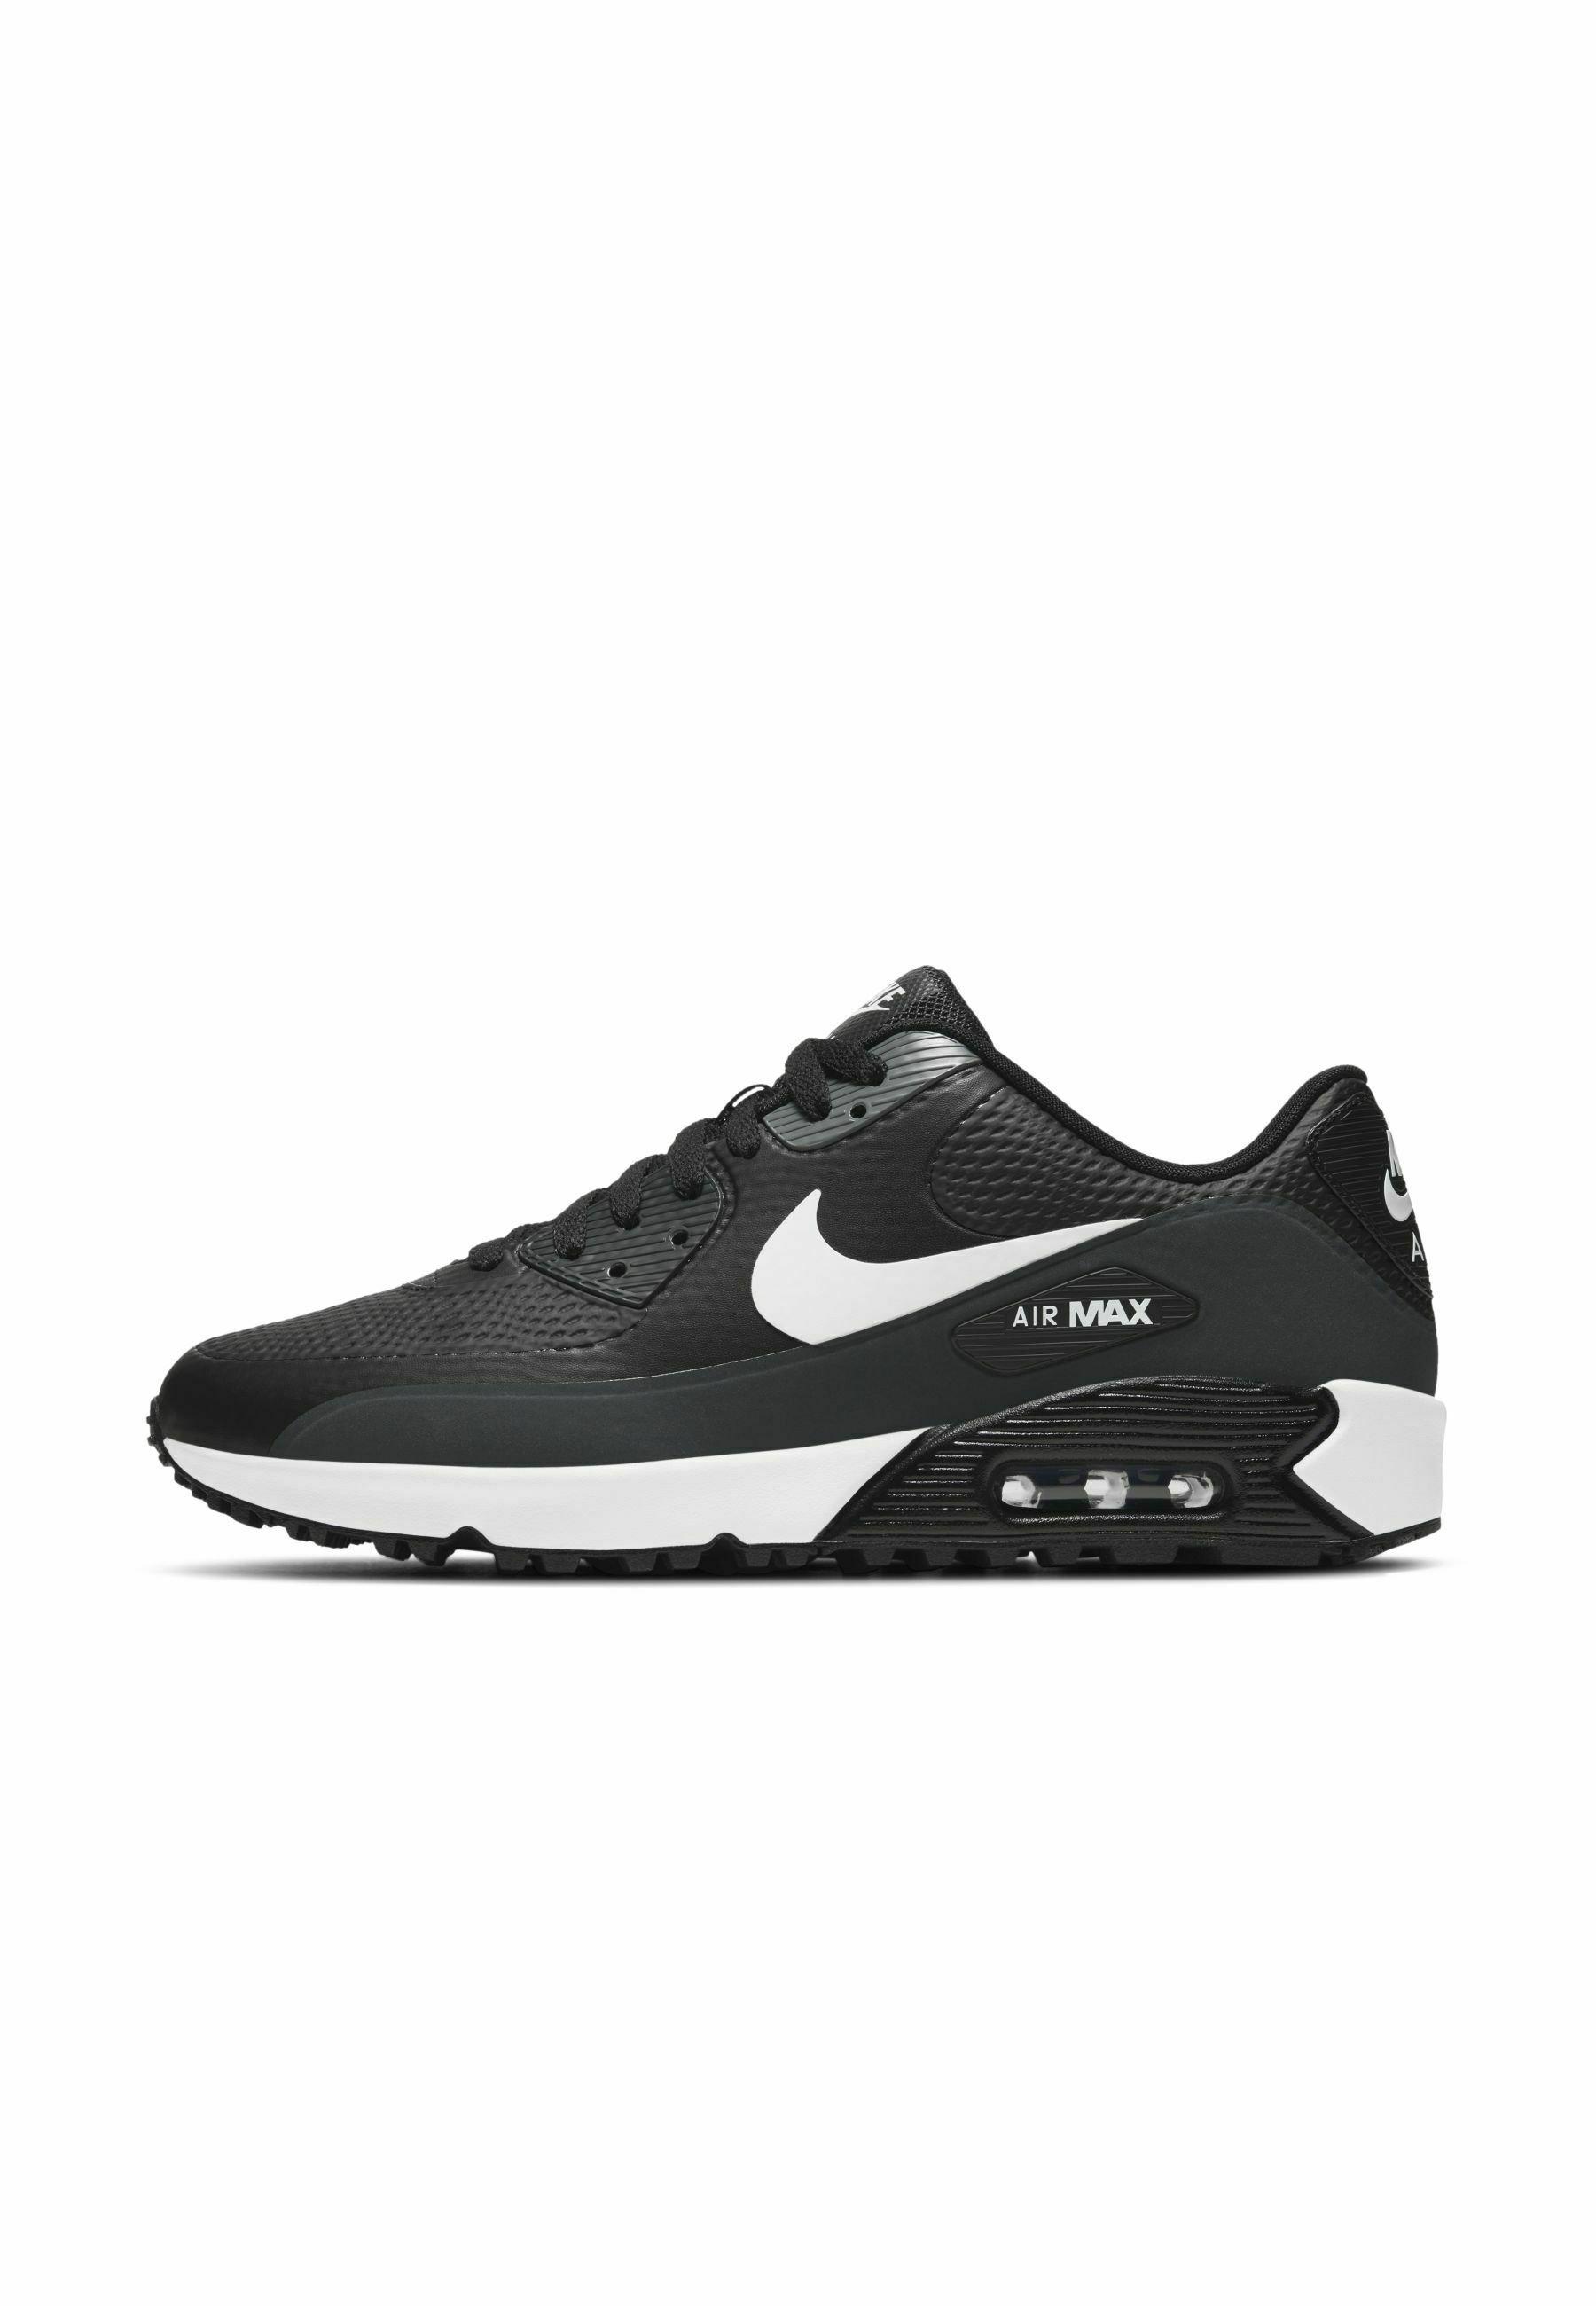 AIR MAX 90 G - Chaussures de golf - black/white-anthracite-cool grey